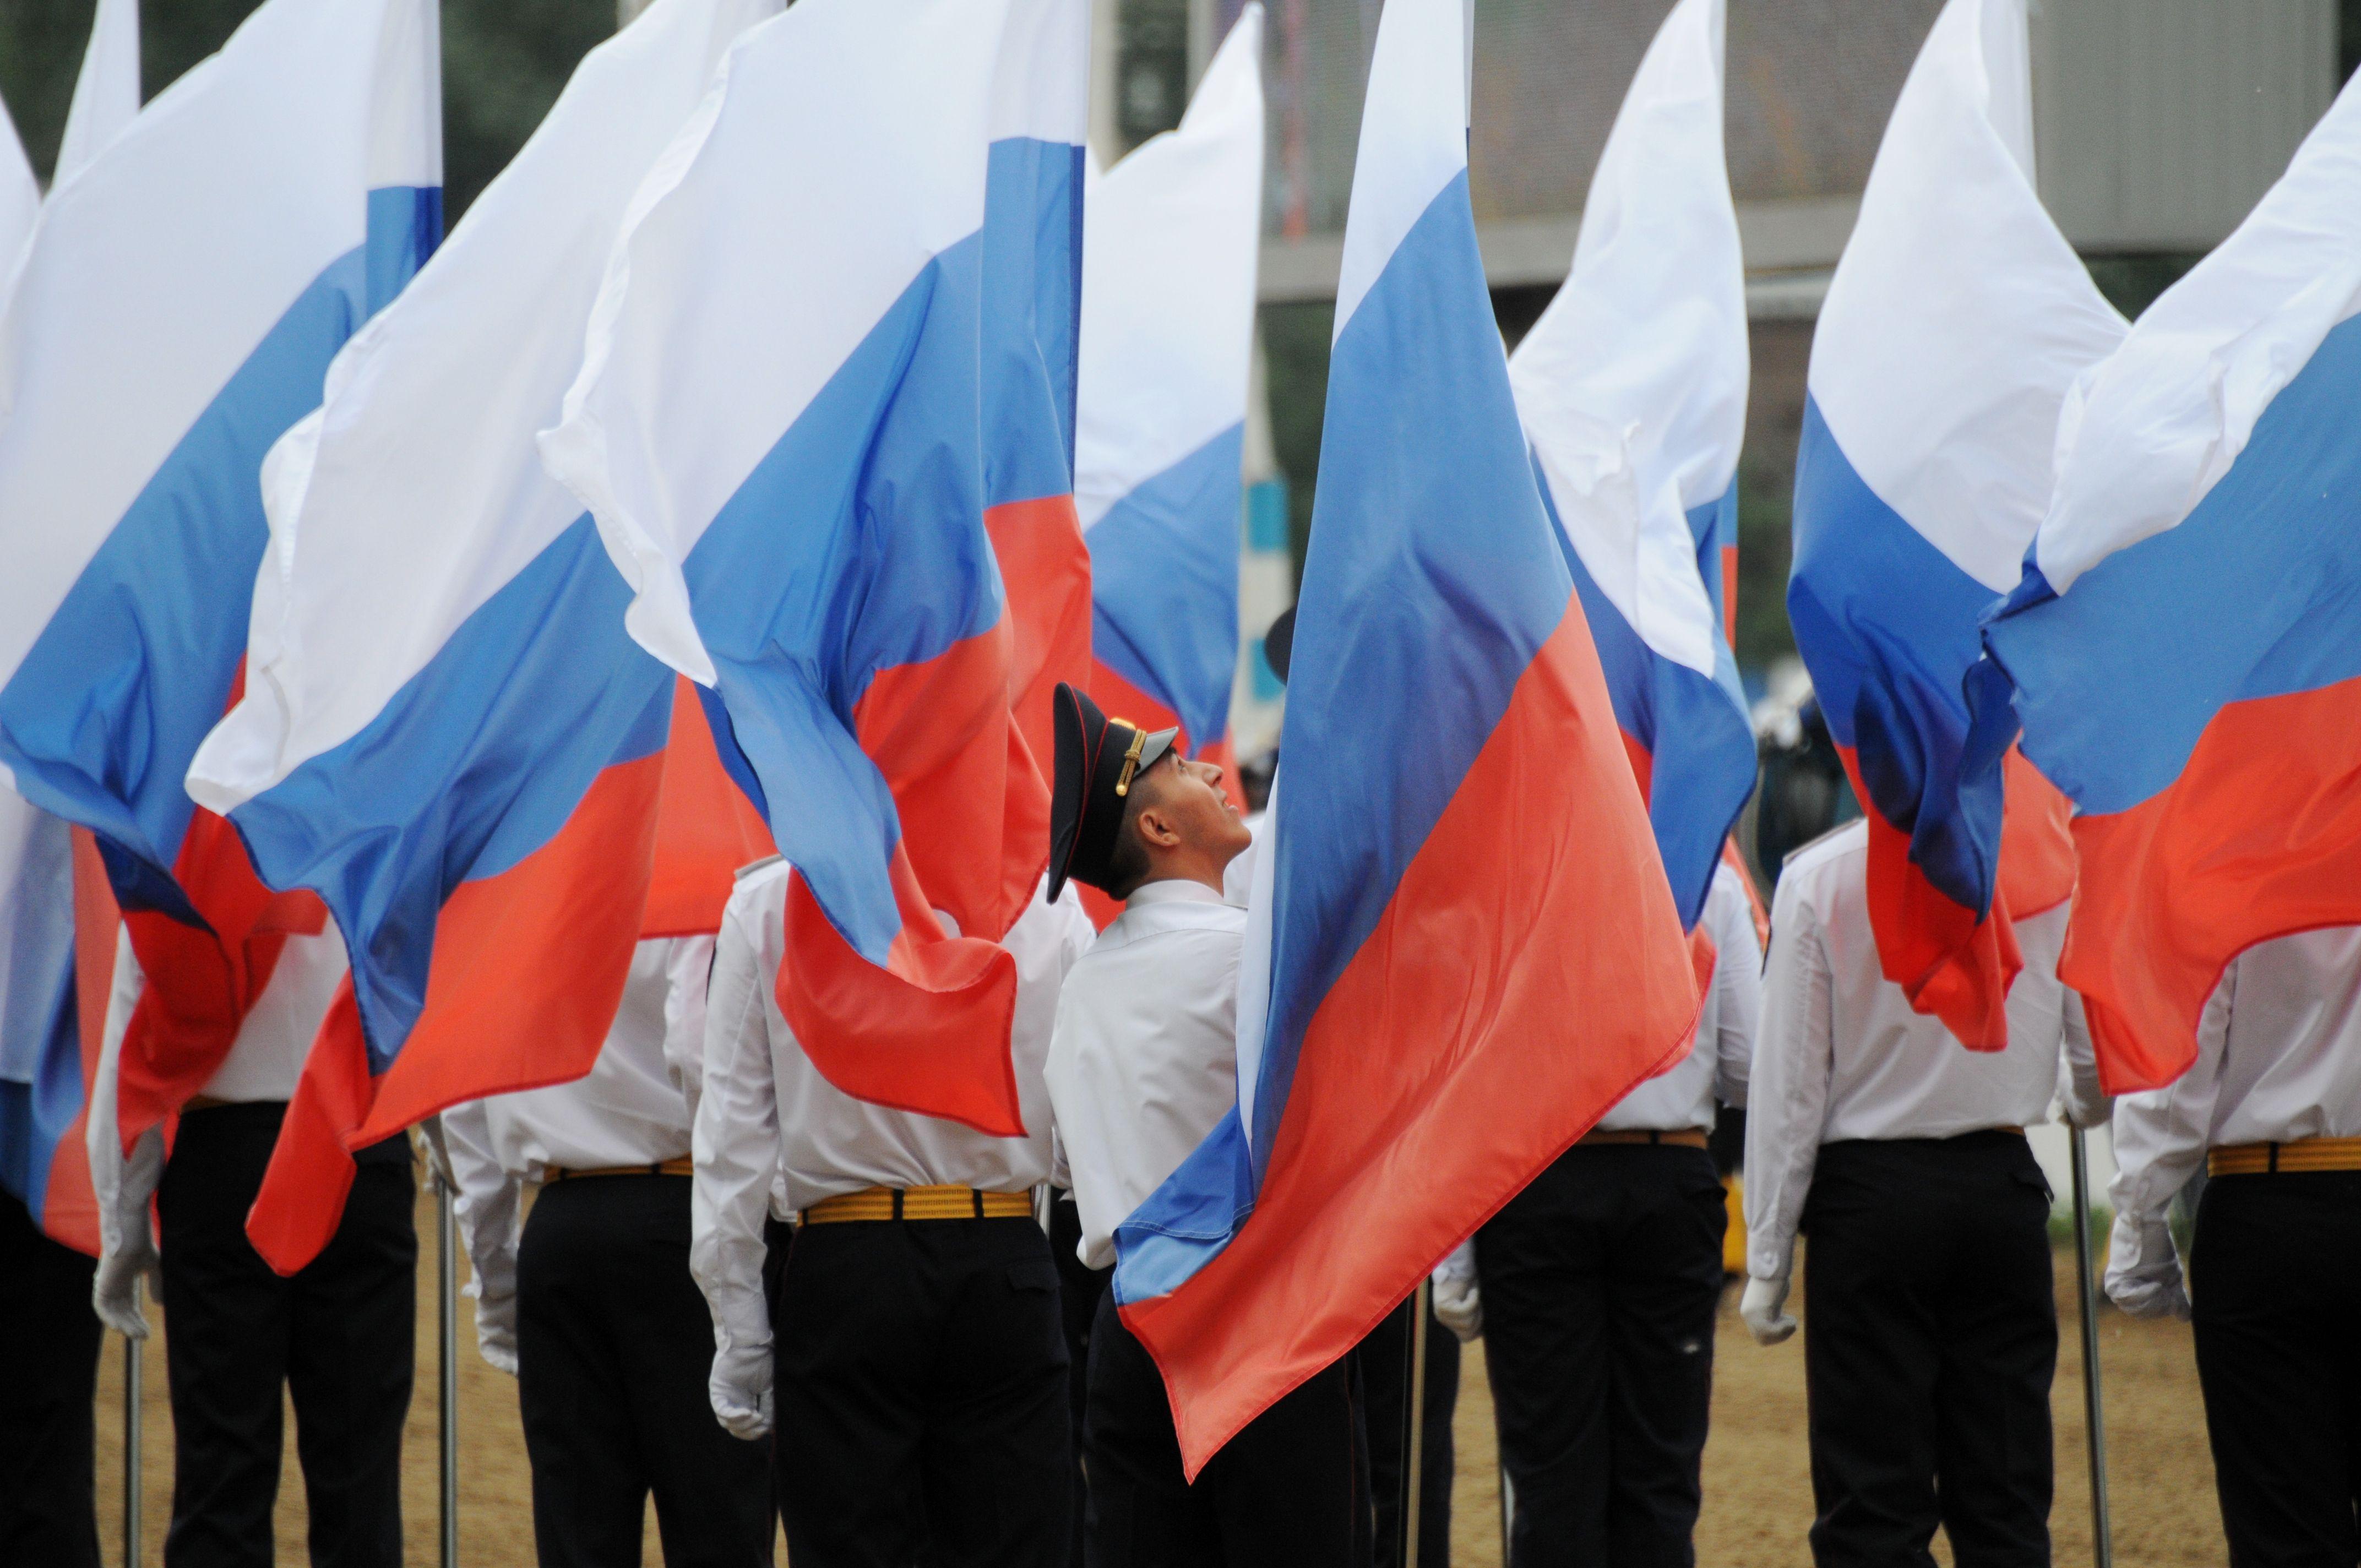 Участники флешмоба на Сахарова развернули гигантский флаг России